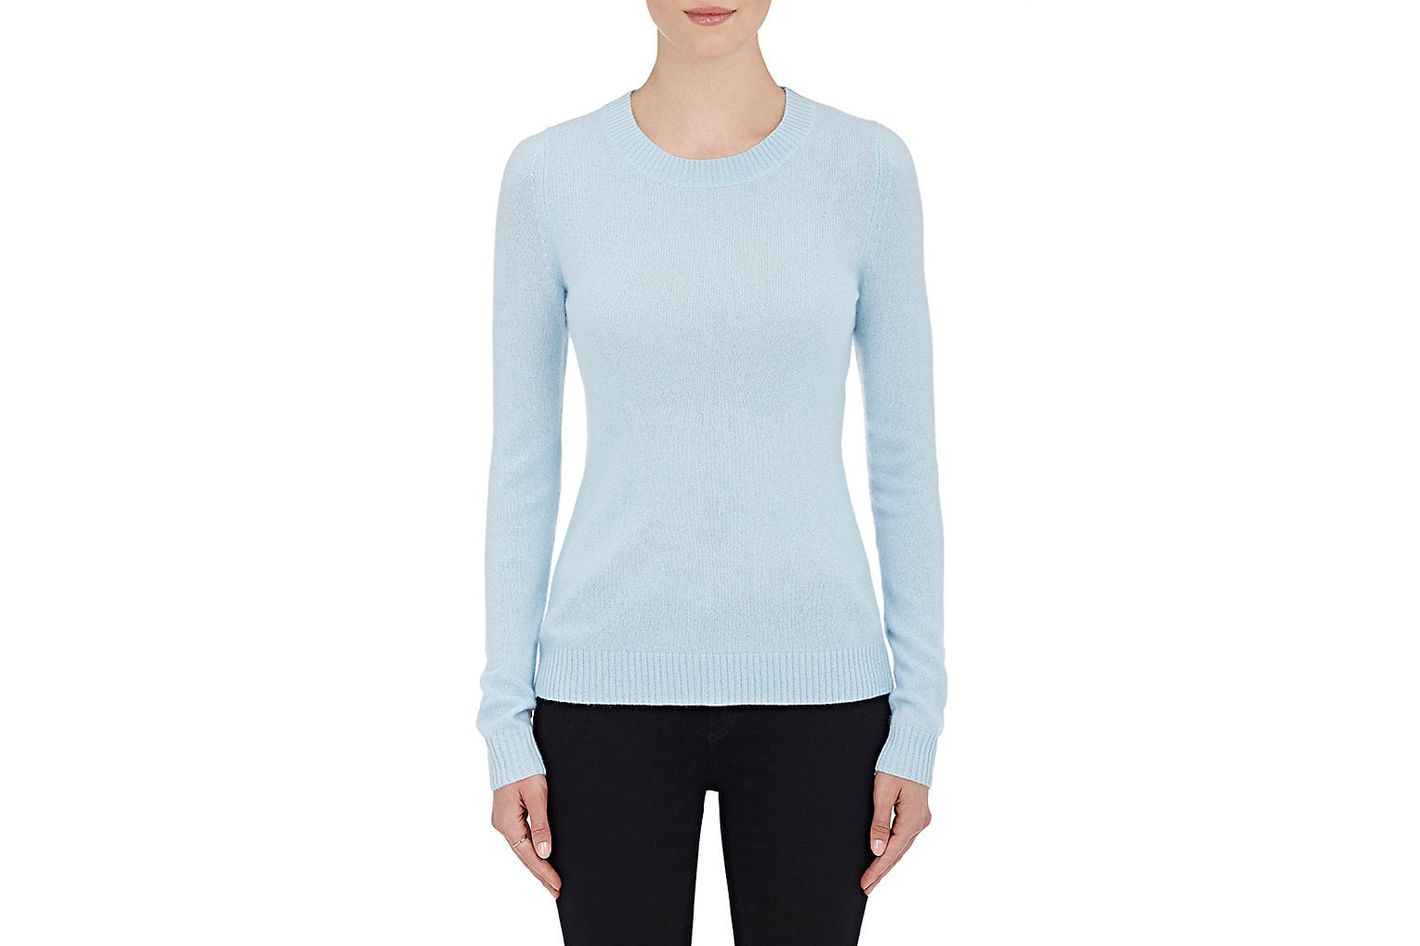 Barneys New York Cashmere Crewneck Sweater